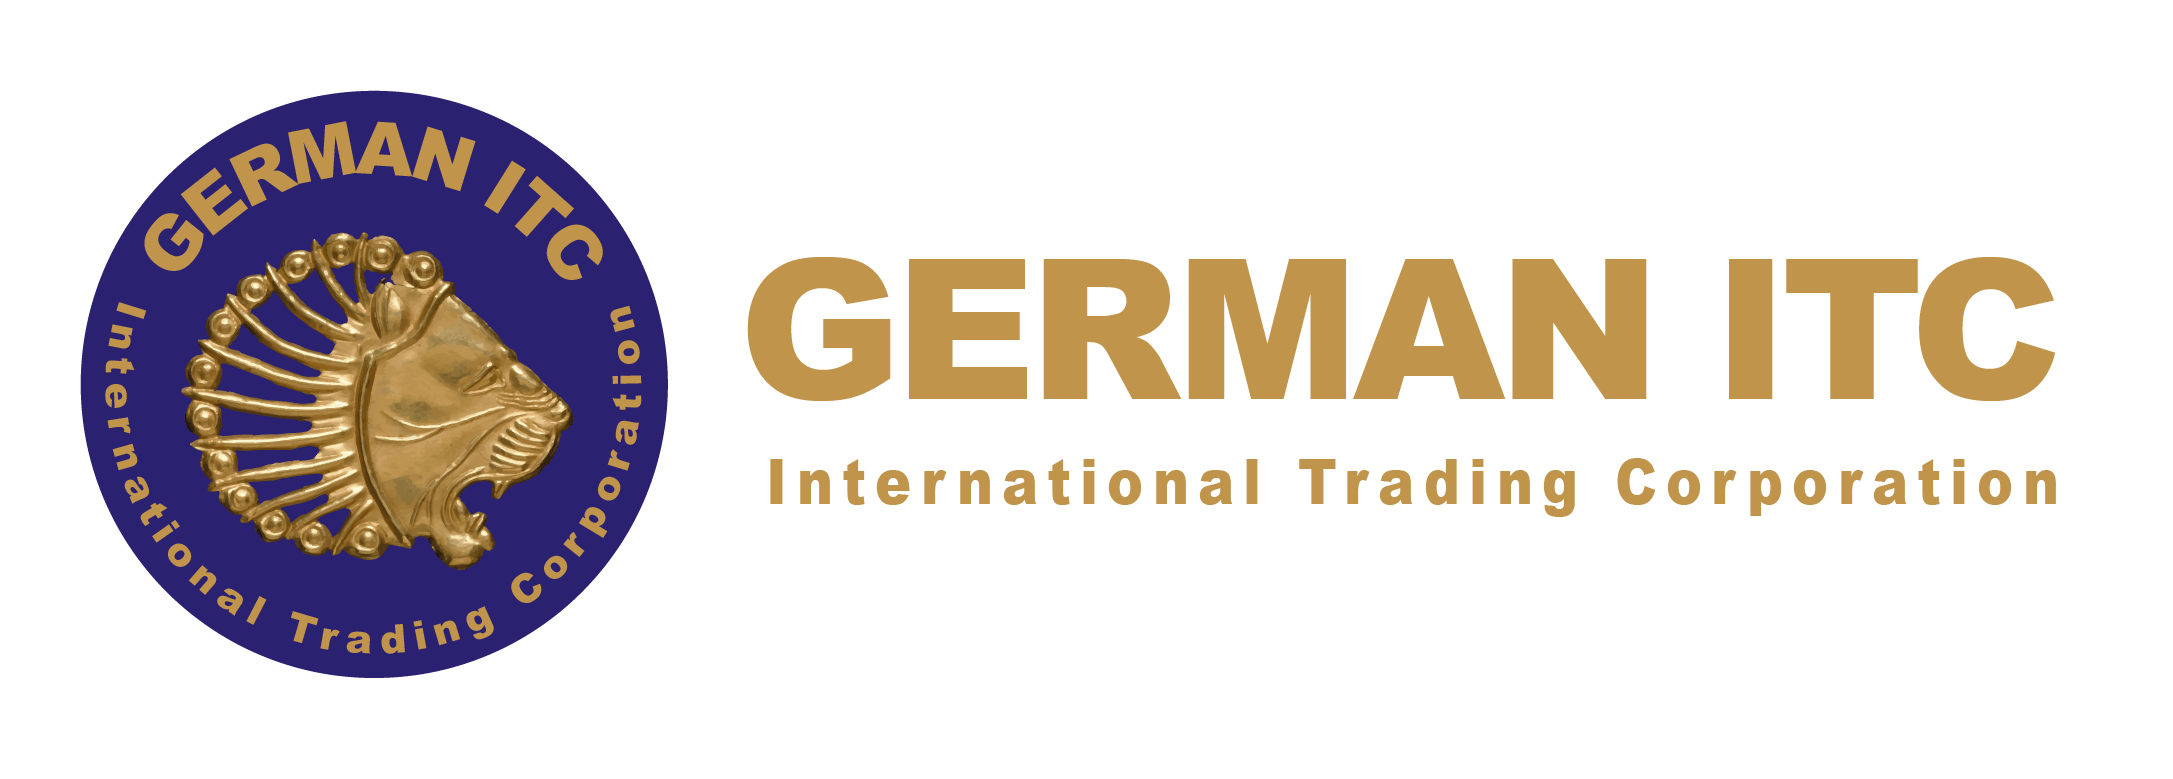 German ITC